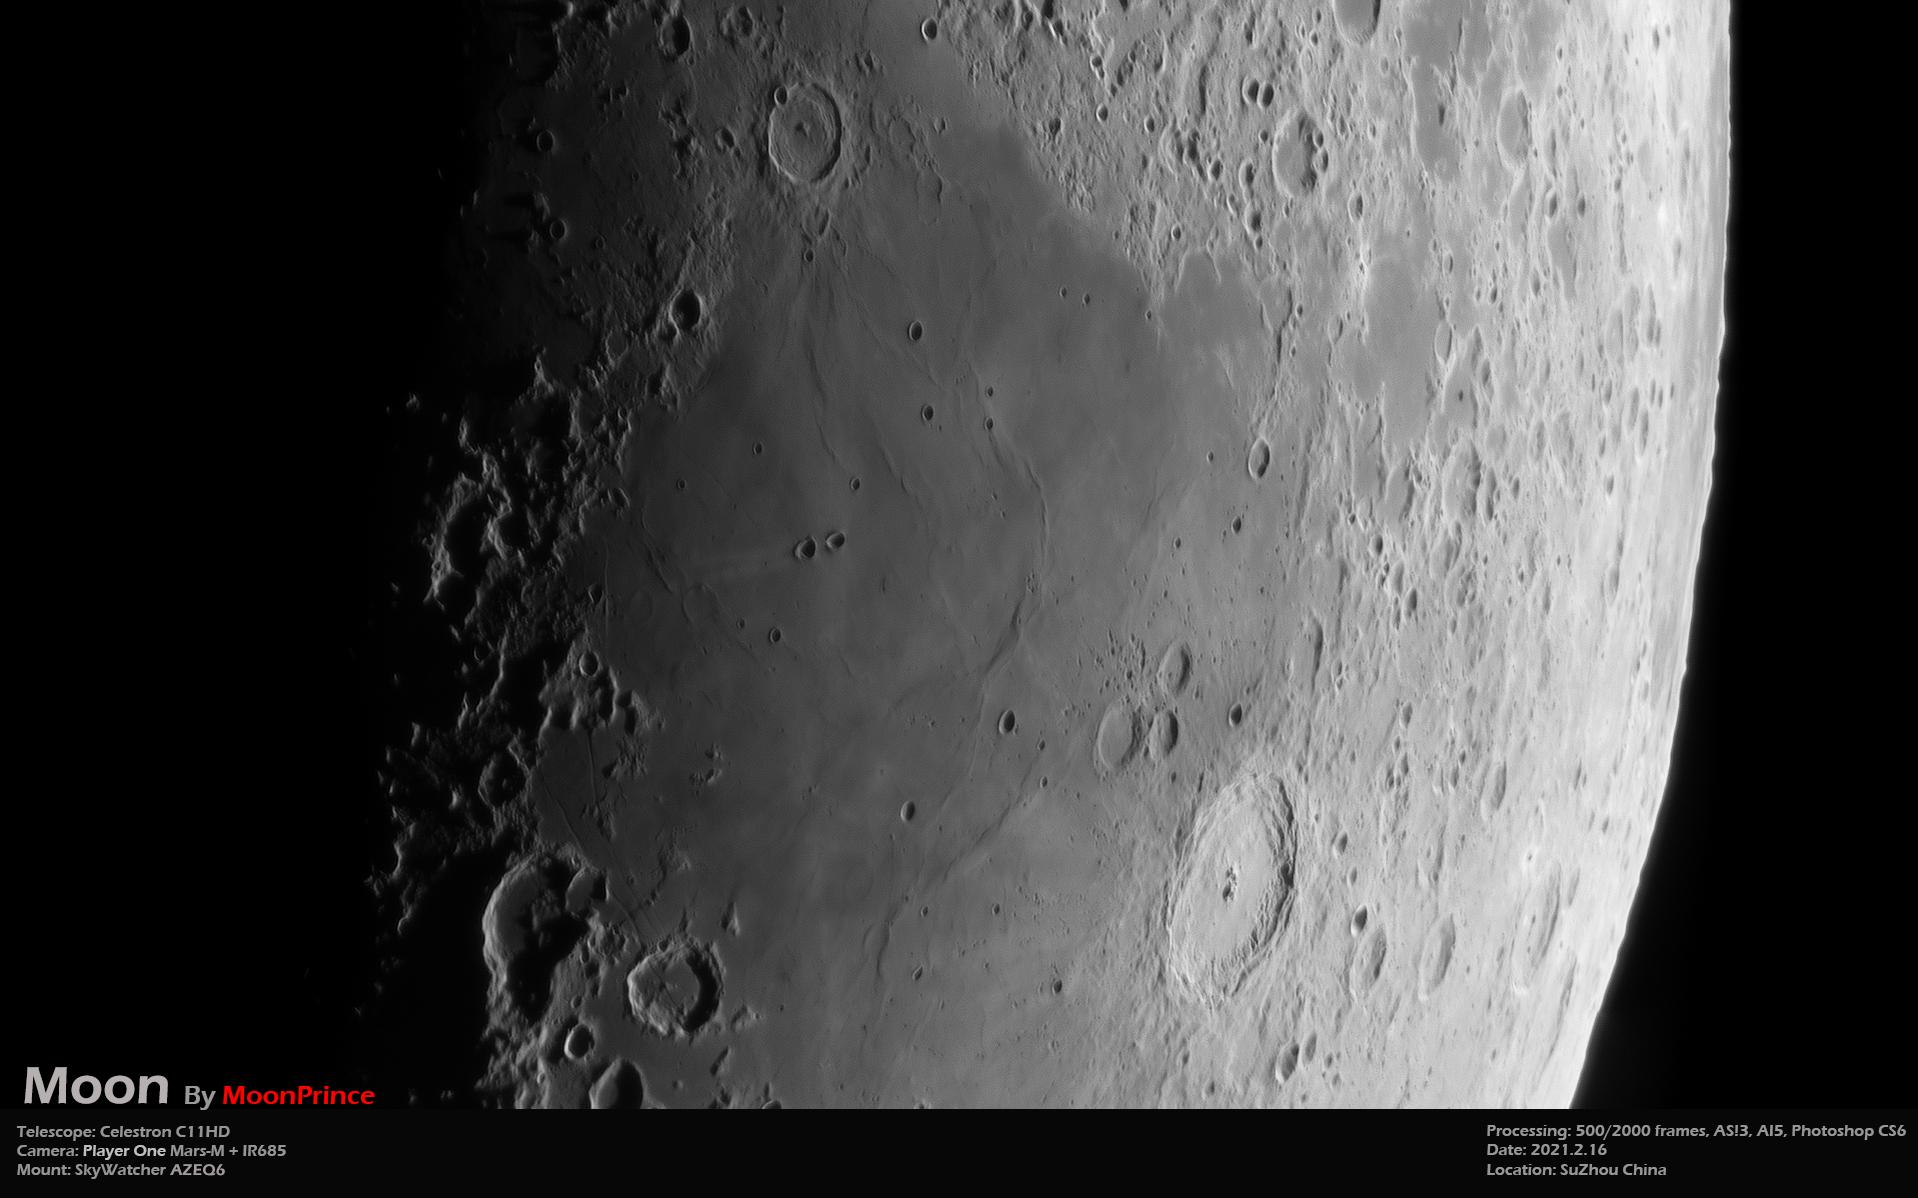 Moon20210216-S5.jpg